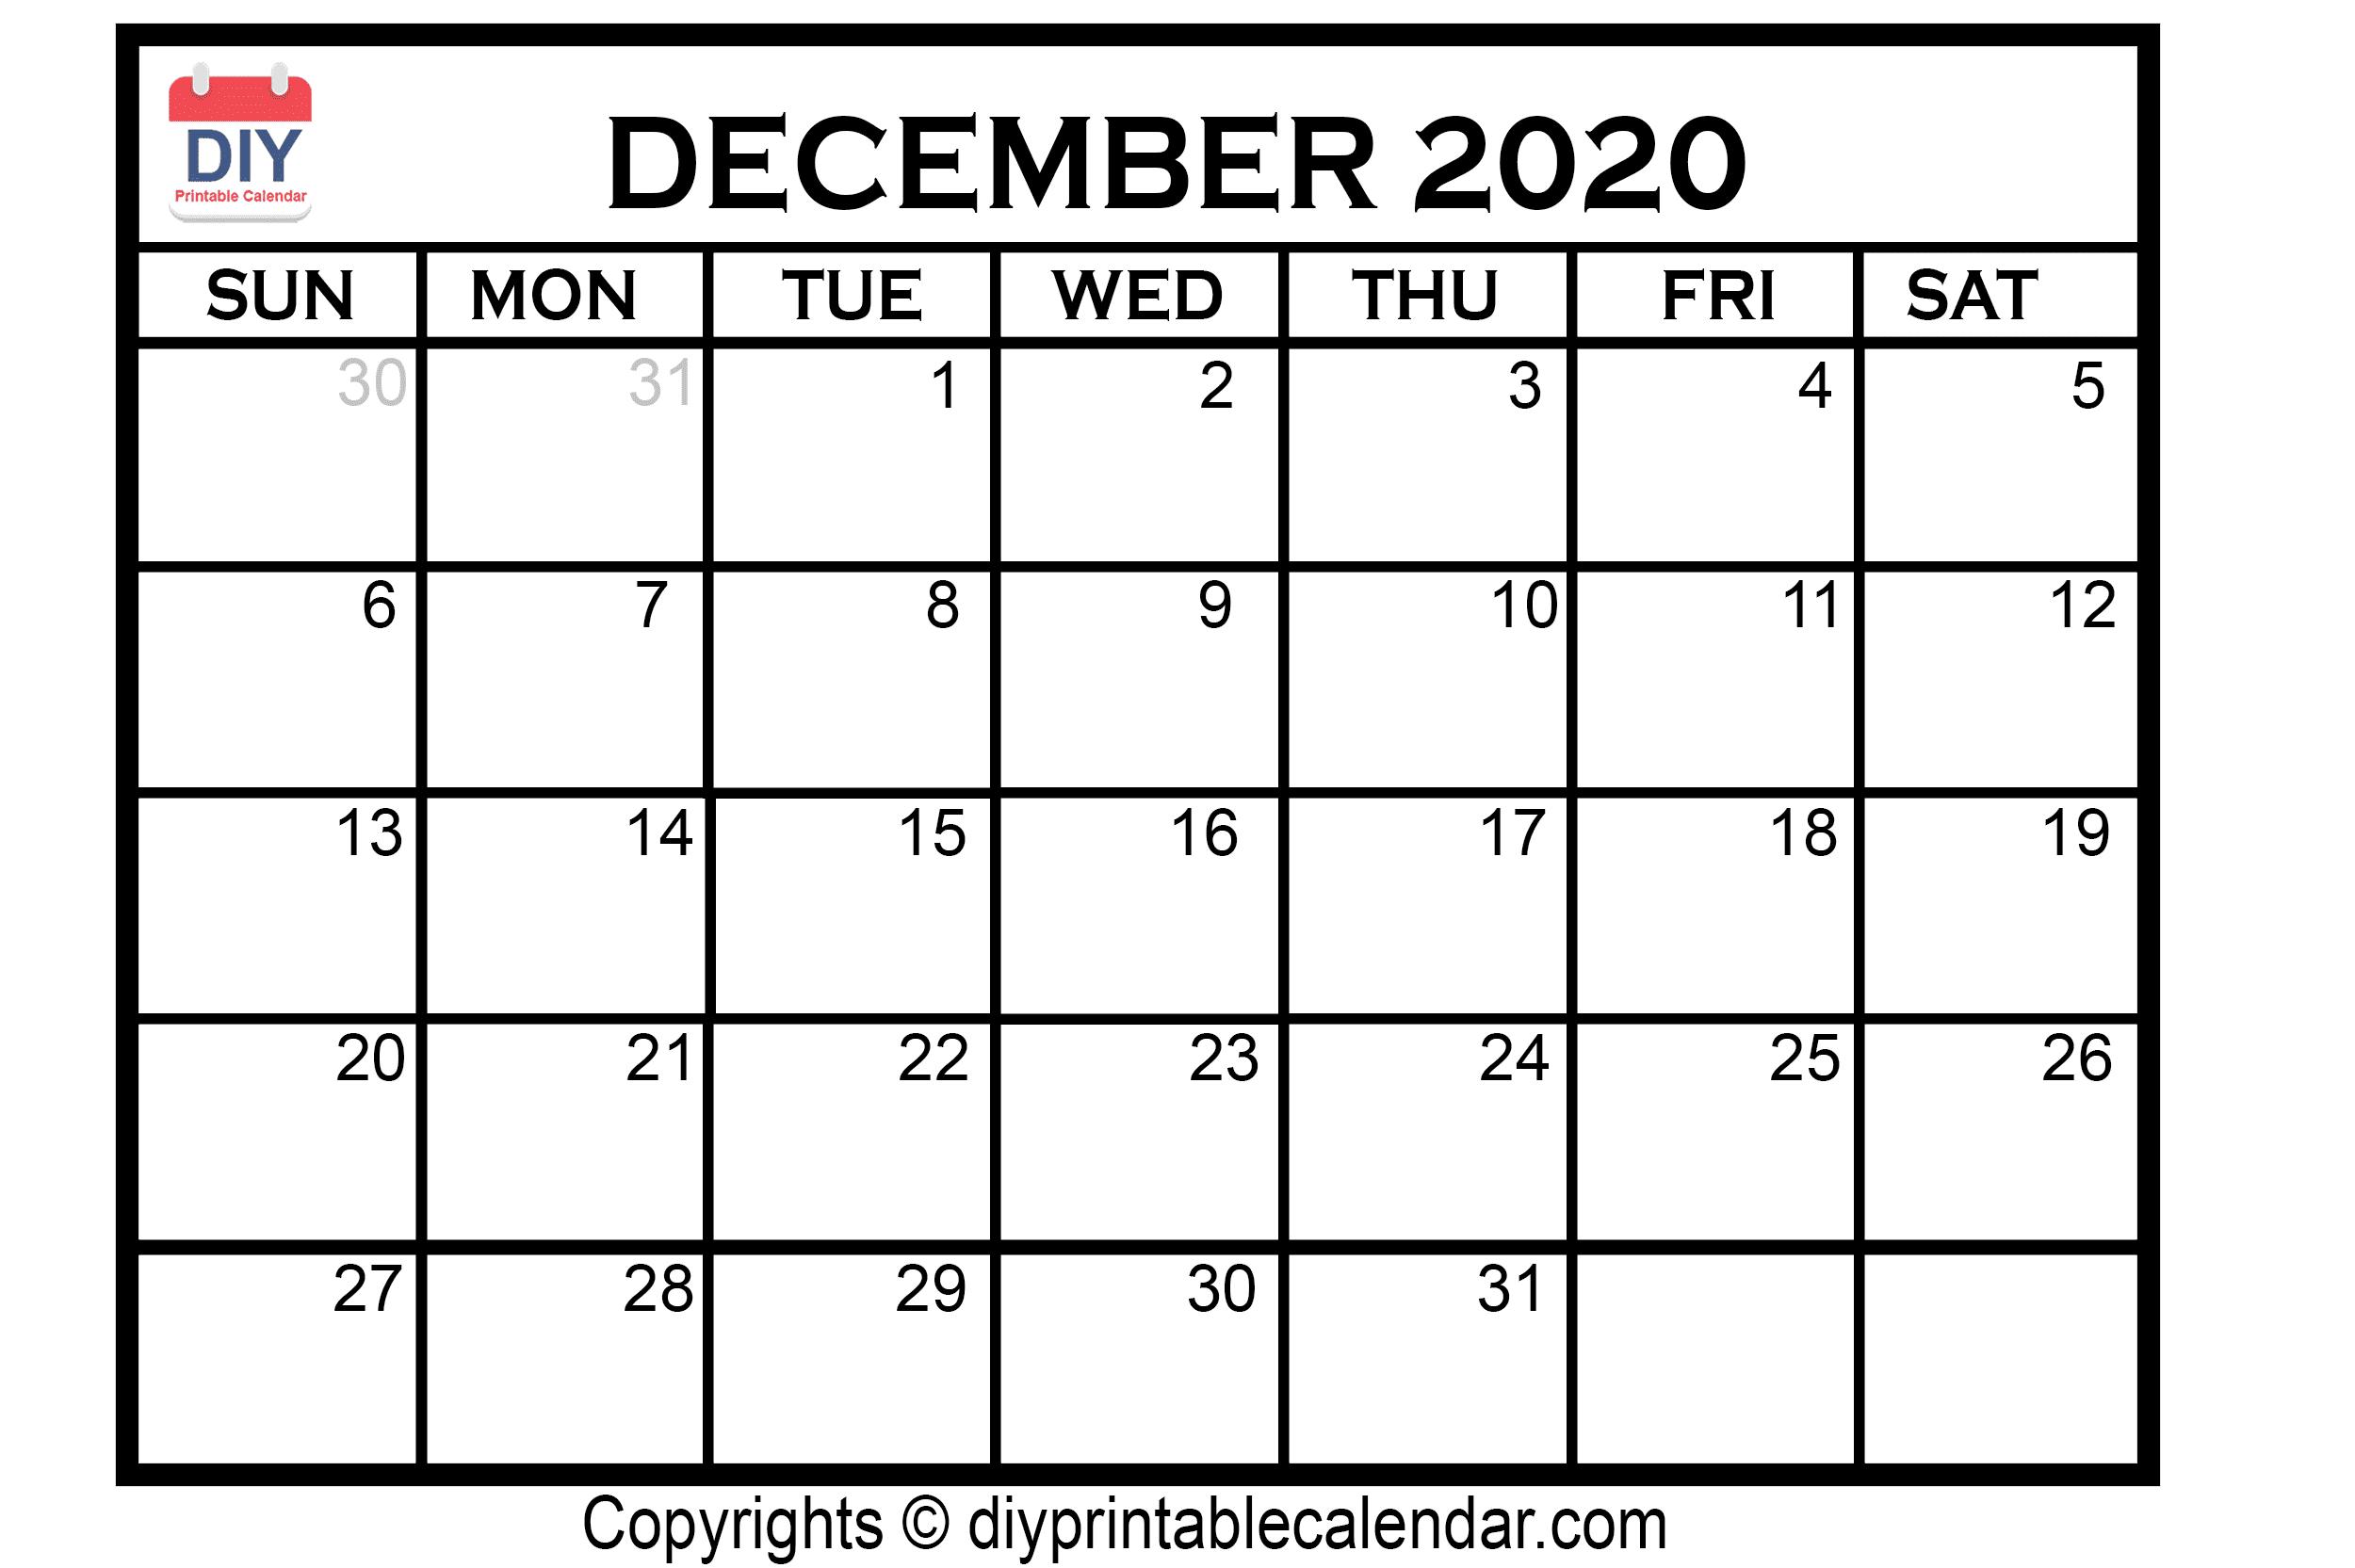 December 2020 Printable Calendar Template